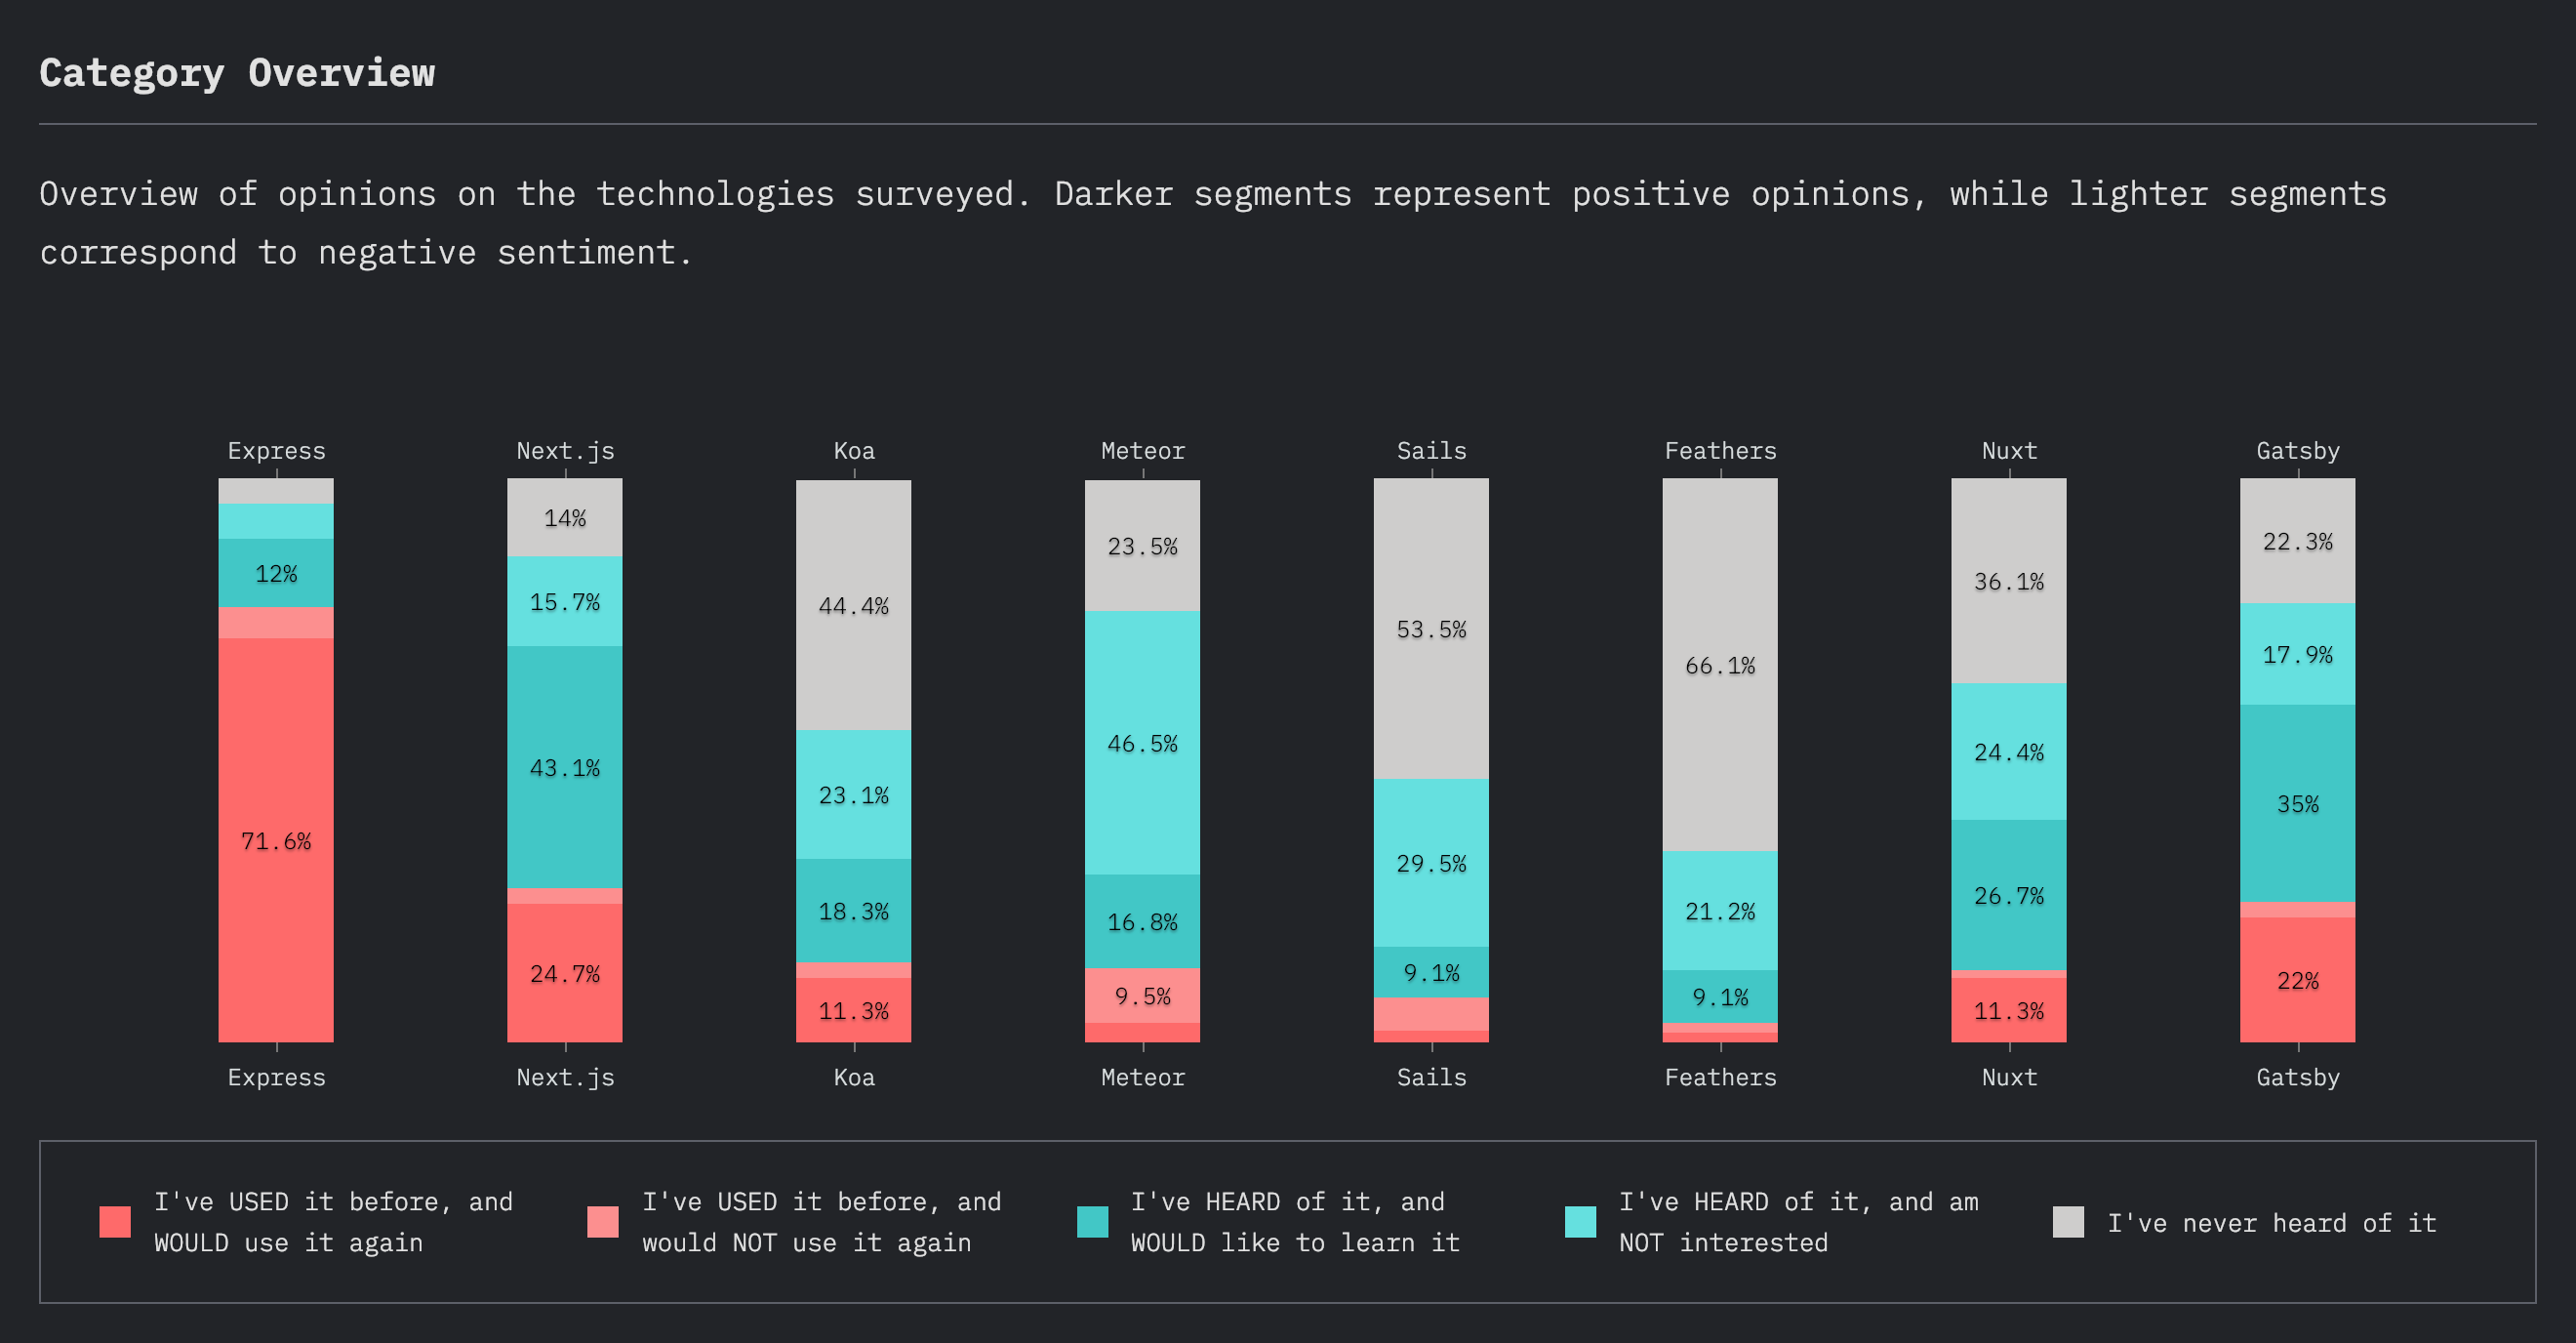 Conocimiento de Backend en JavaScript 2019 (category overview)